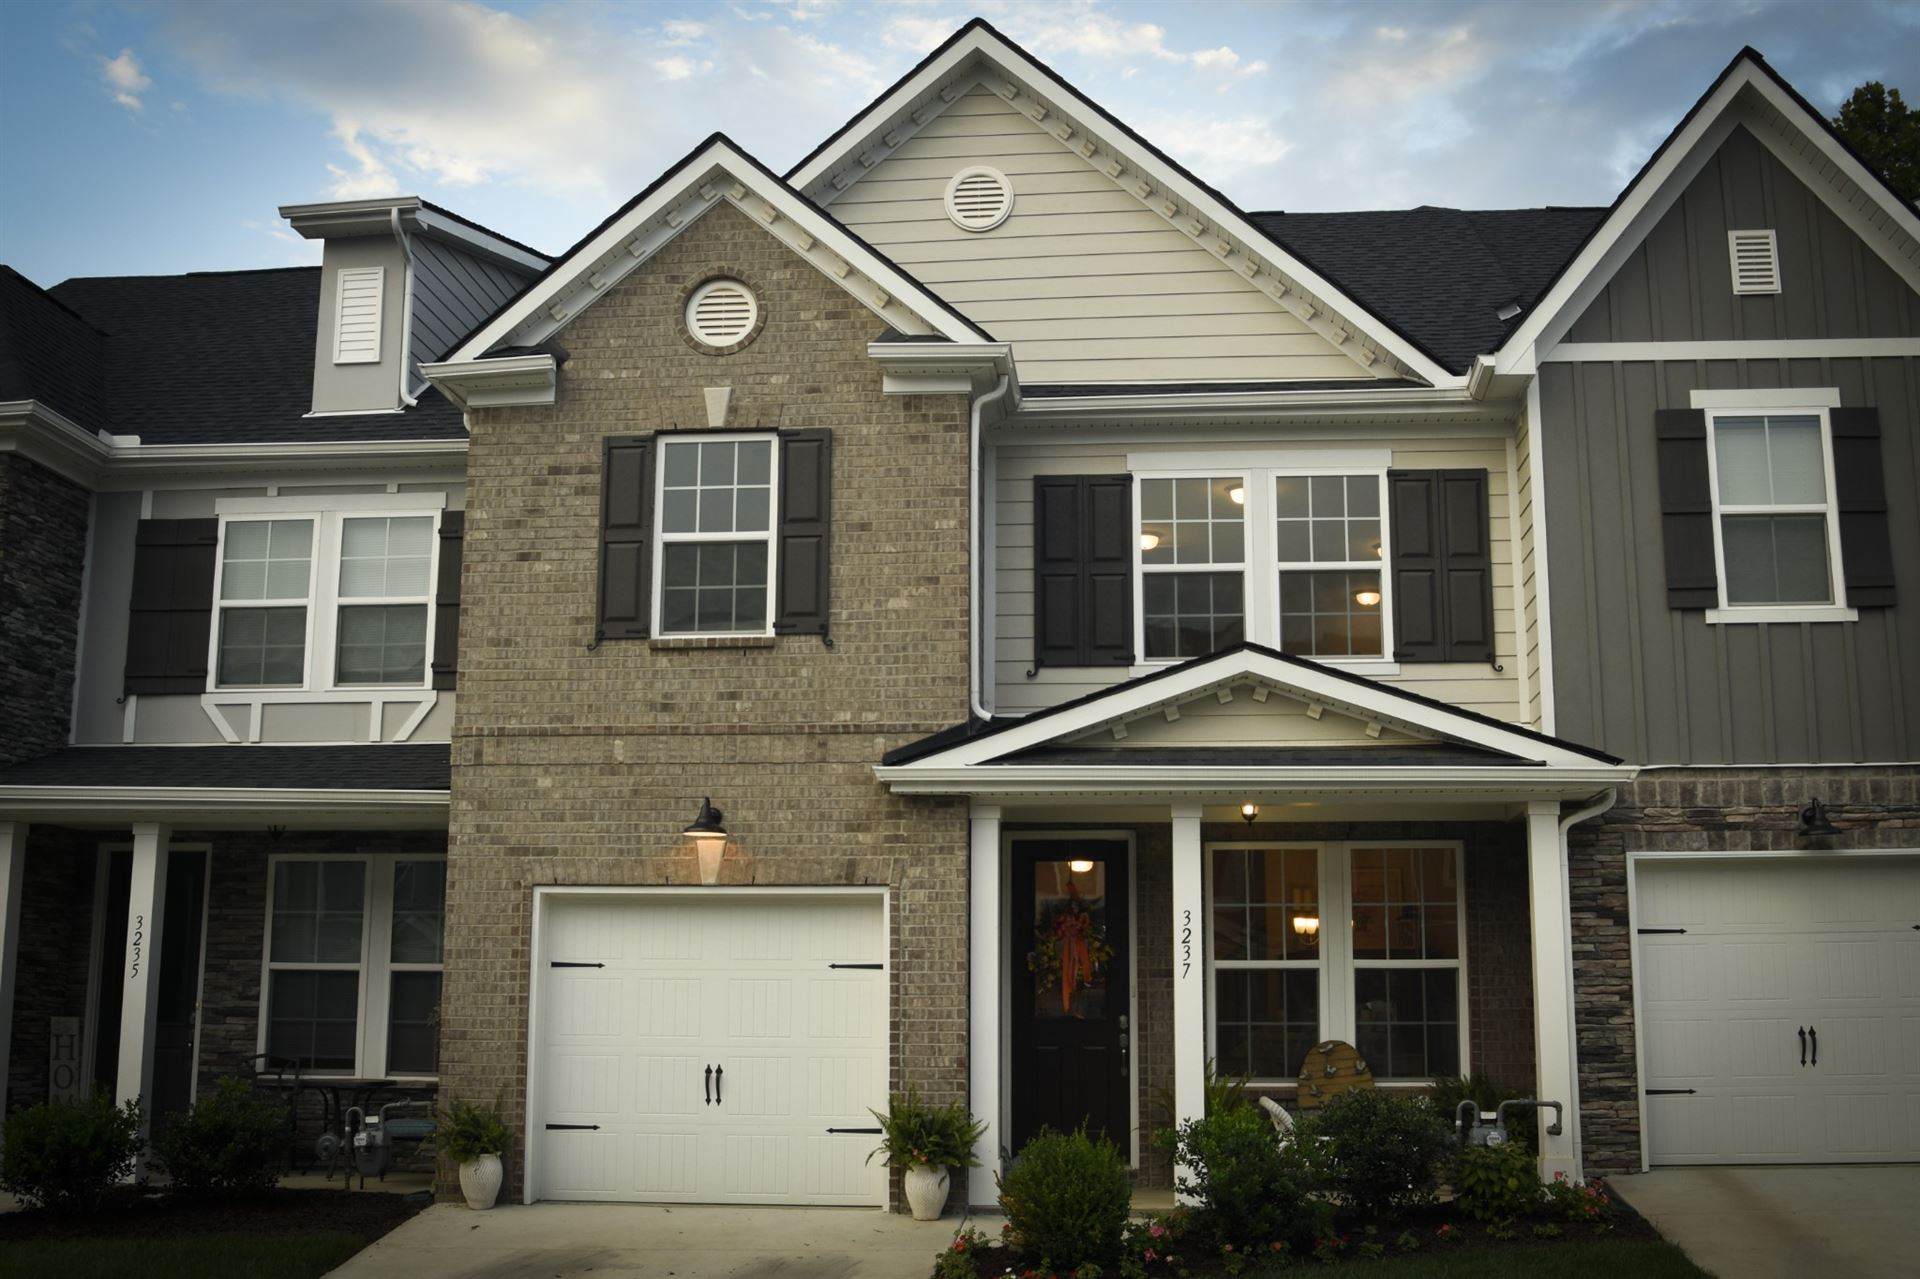 Photo of 3237 Brookberry Ln, Murfreesboro, TN 37129 (MLS # 2229881)